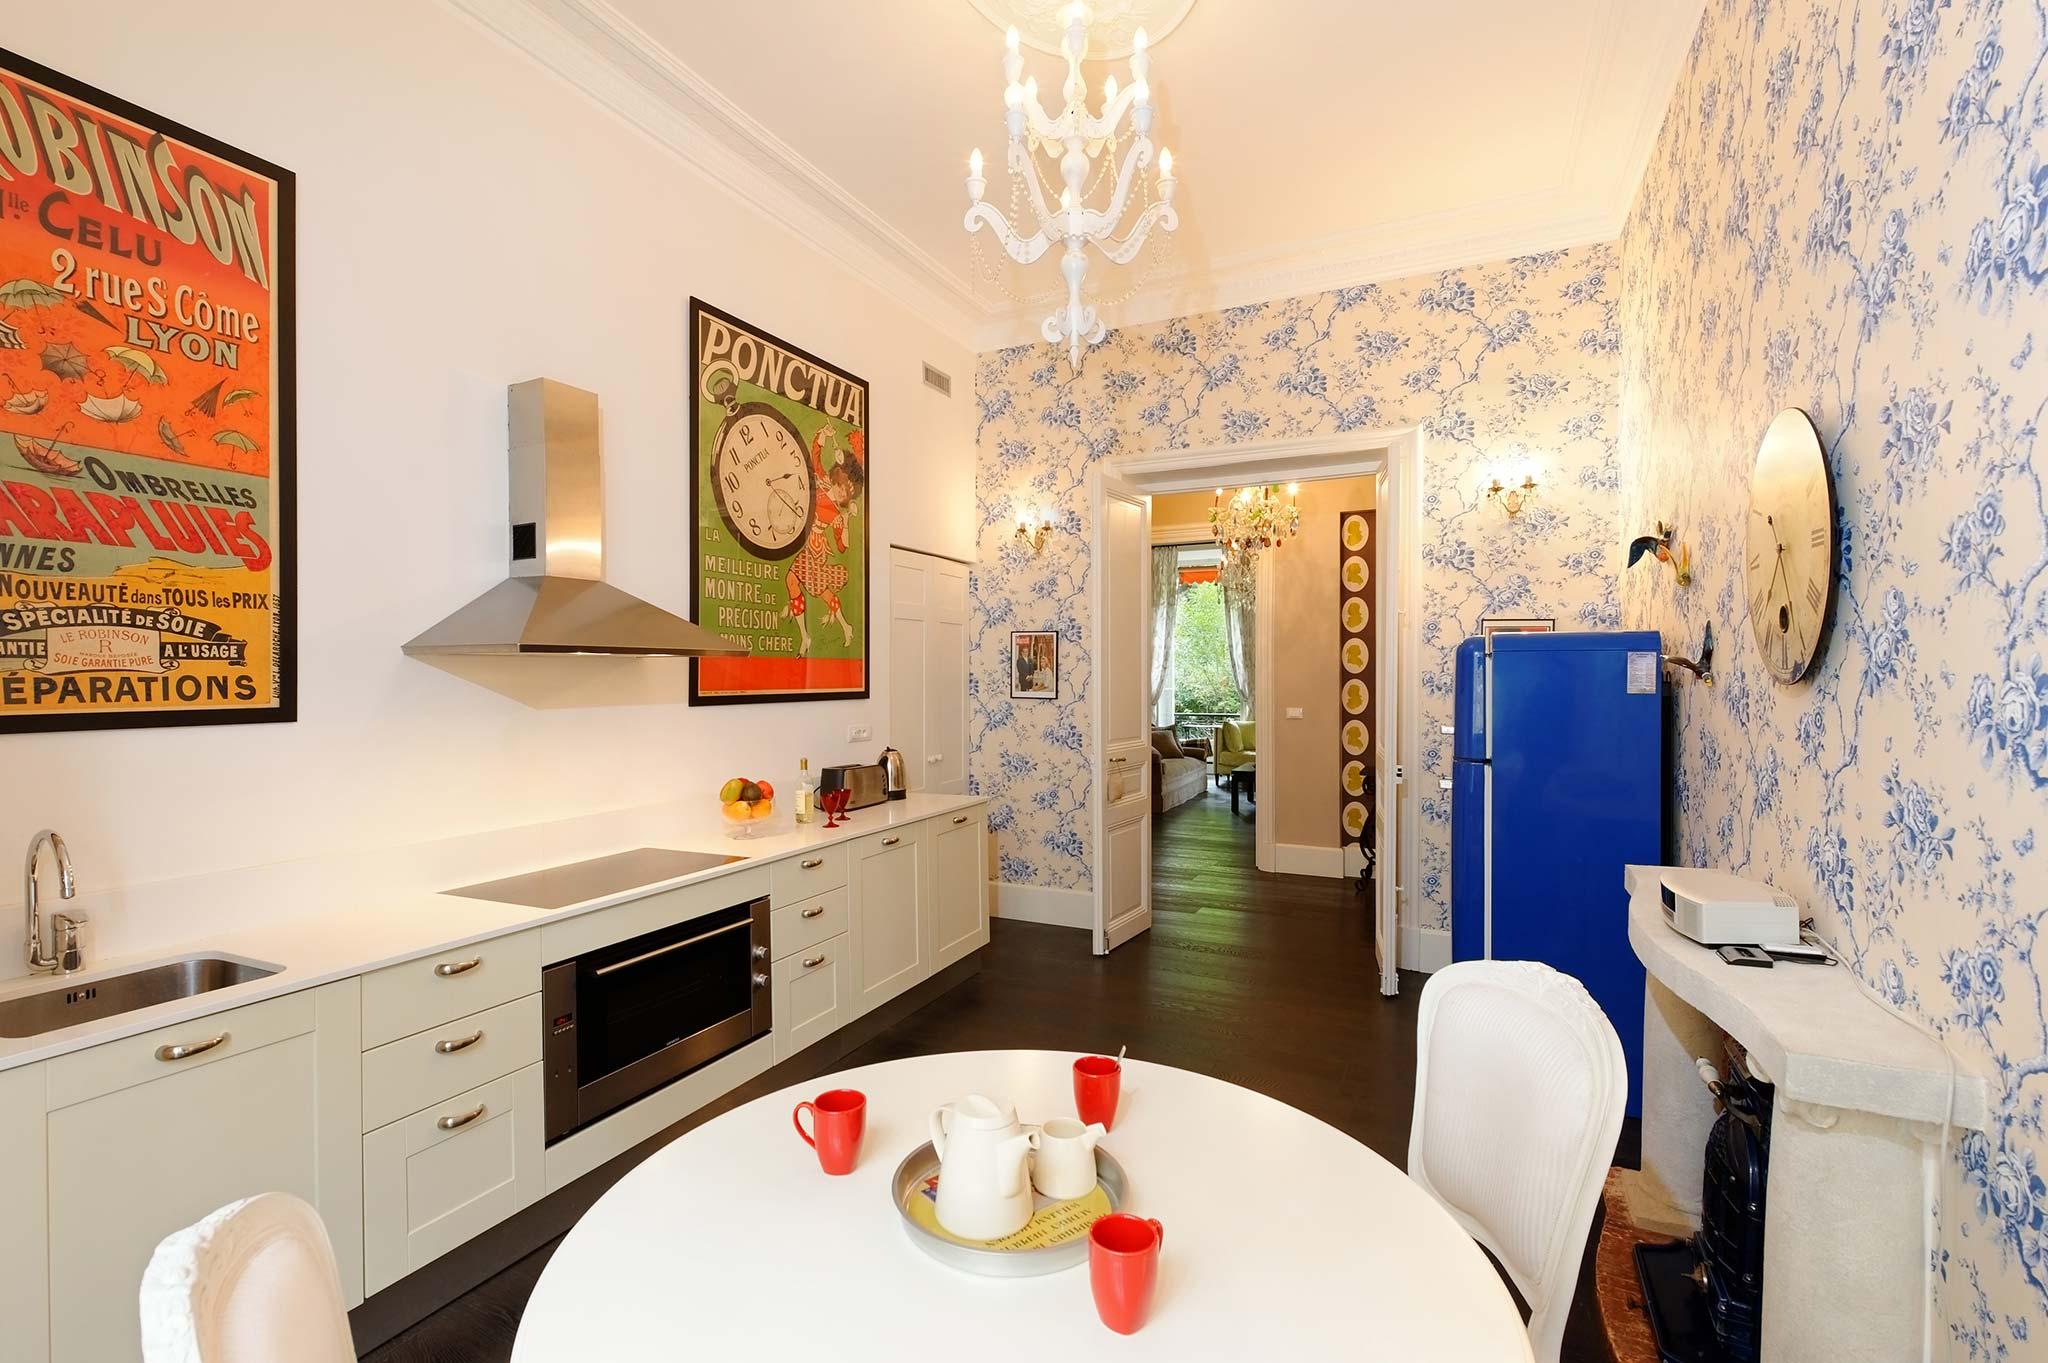 interior design service Callender Howorth